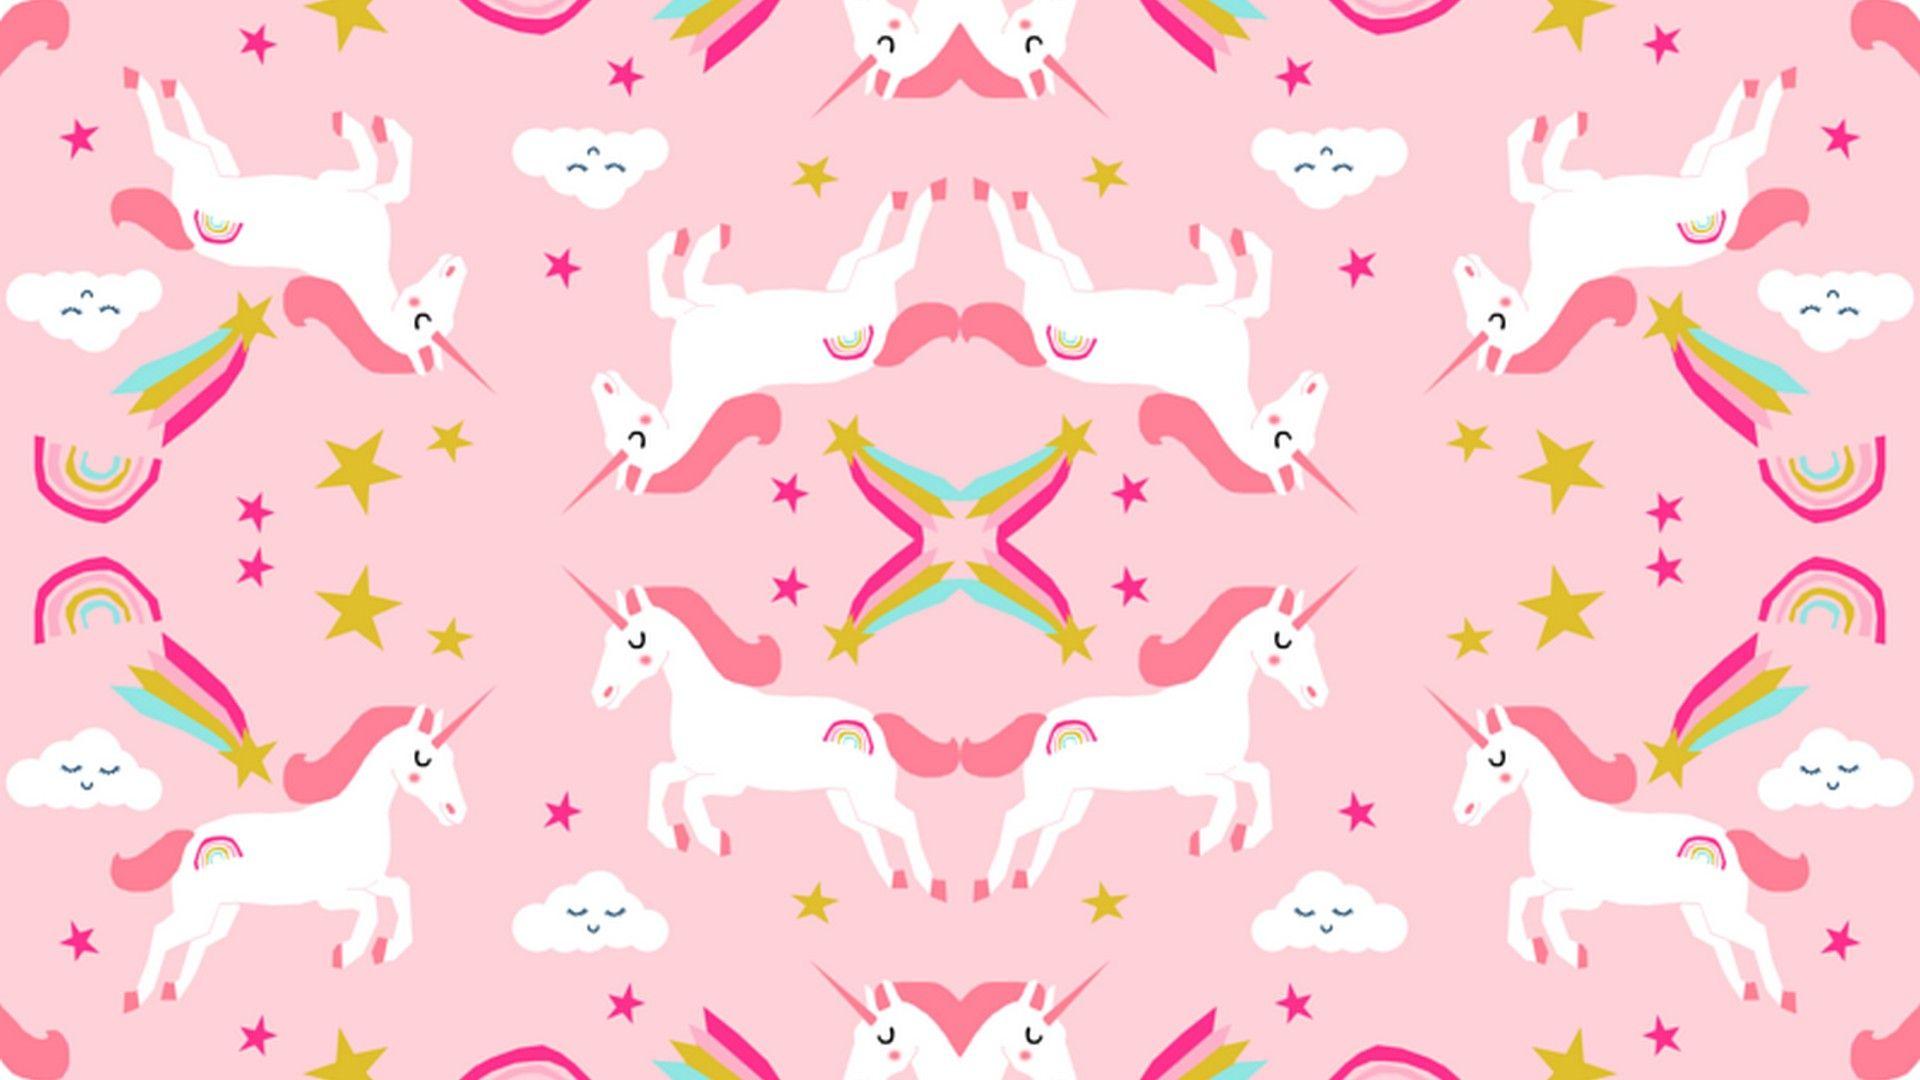 Cute Unicorn Desktop Wallpaper Best Wallpaper Hd In 2020 Hd Cute Wallpapers Cute Unicorn Cute Wallpapers